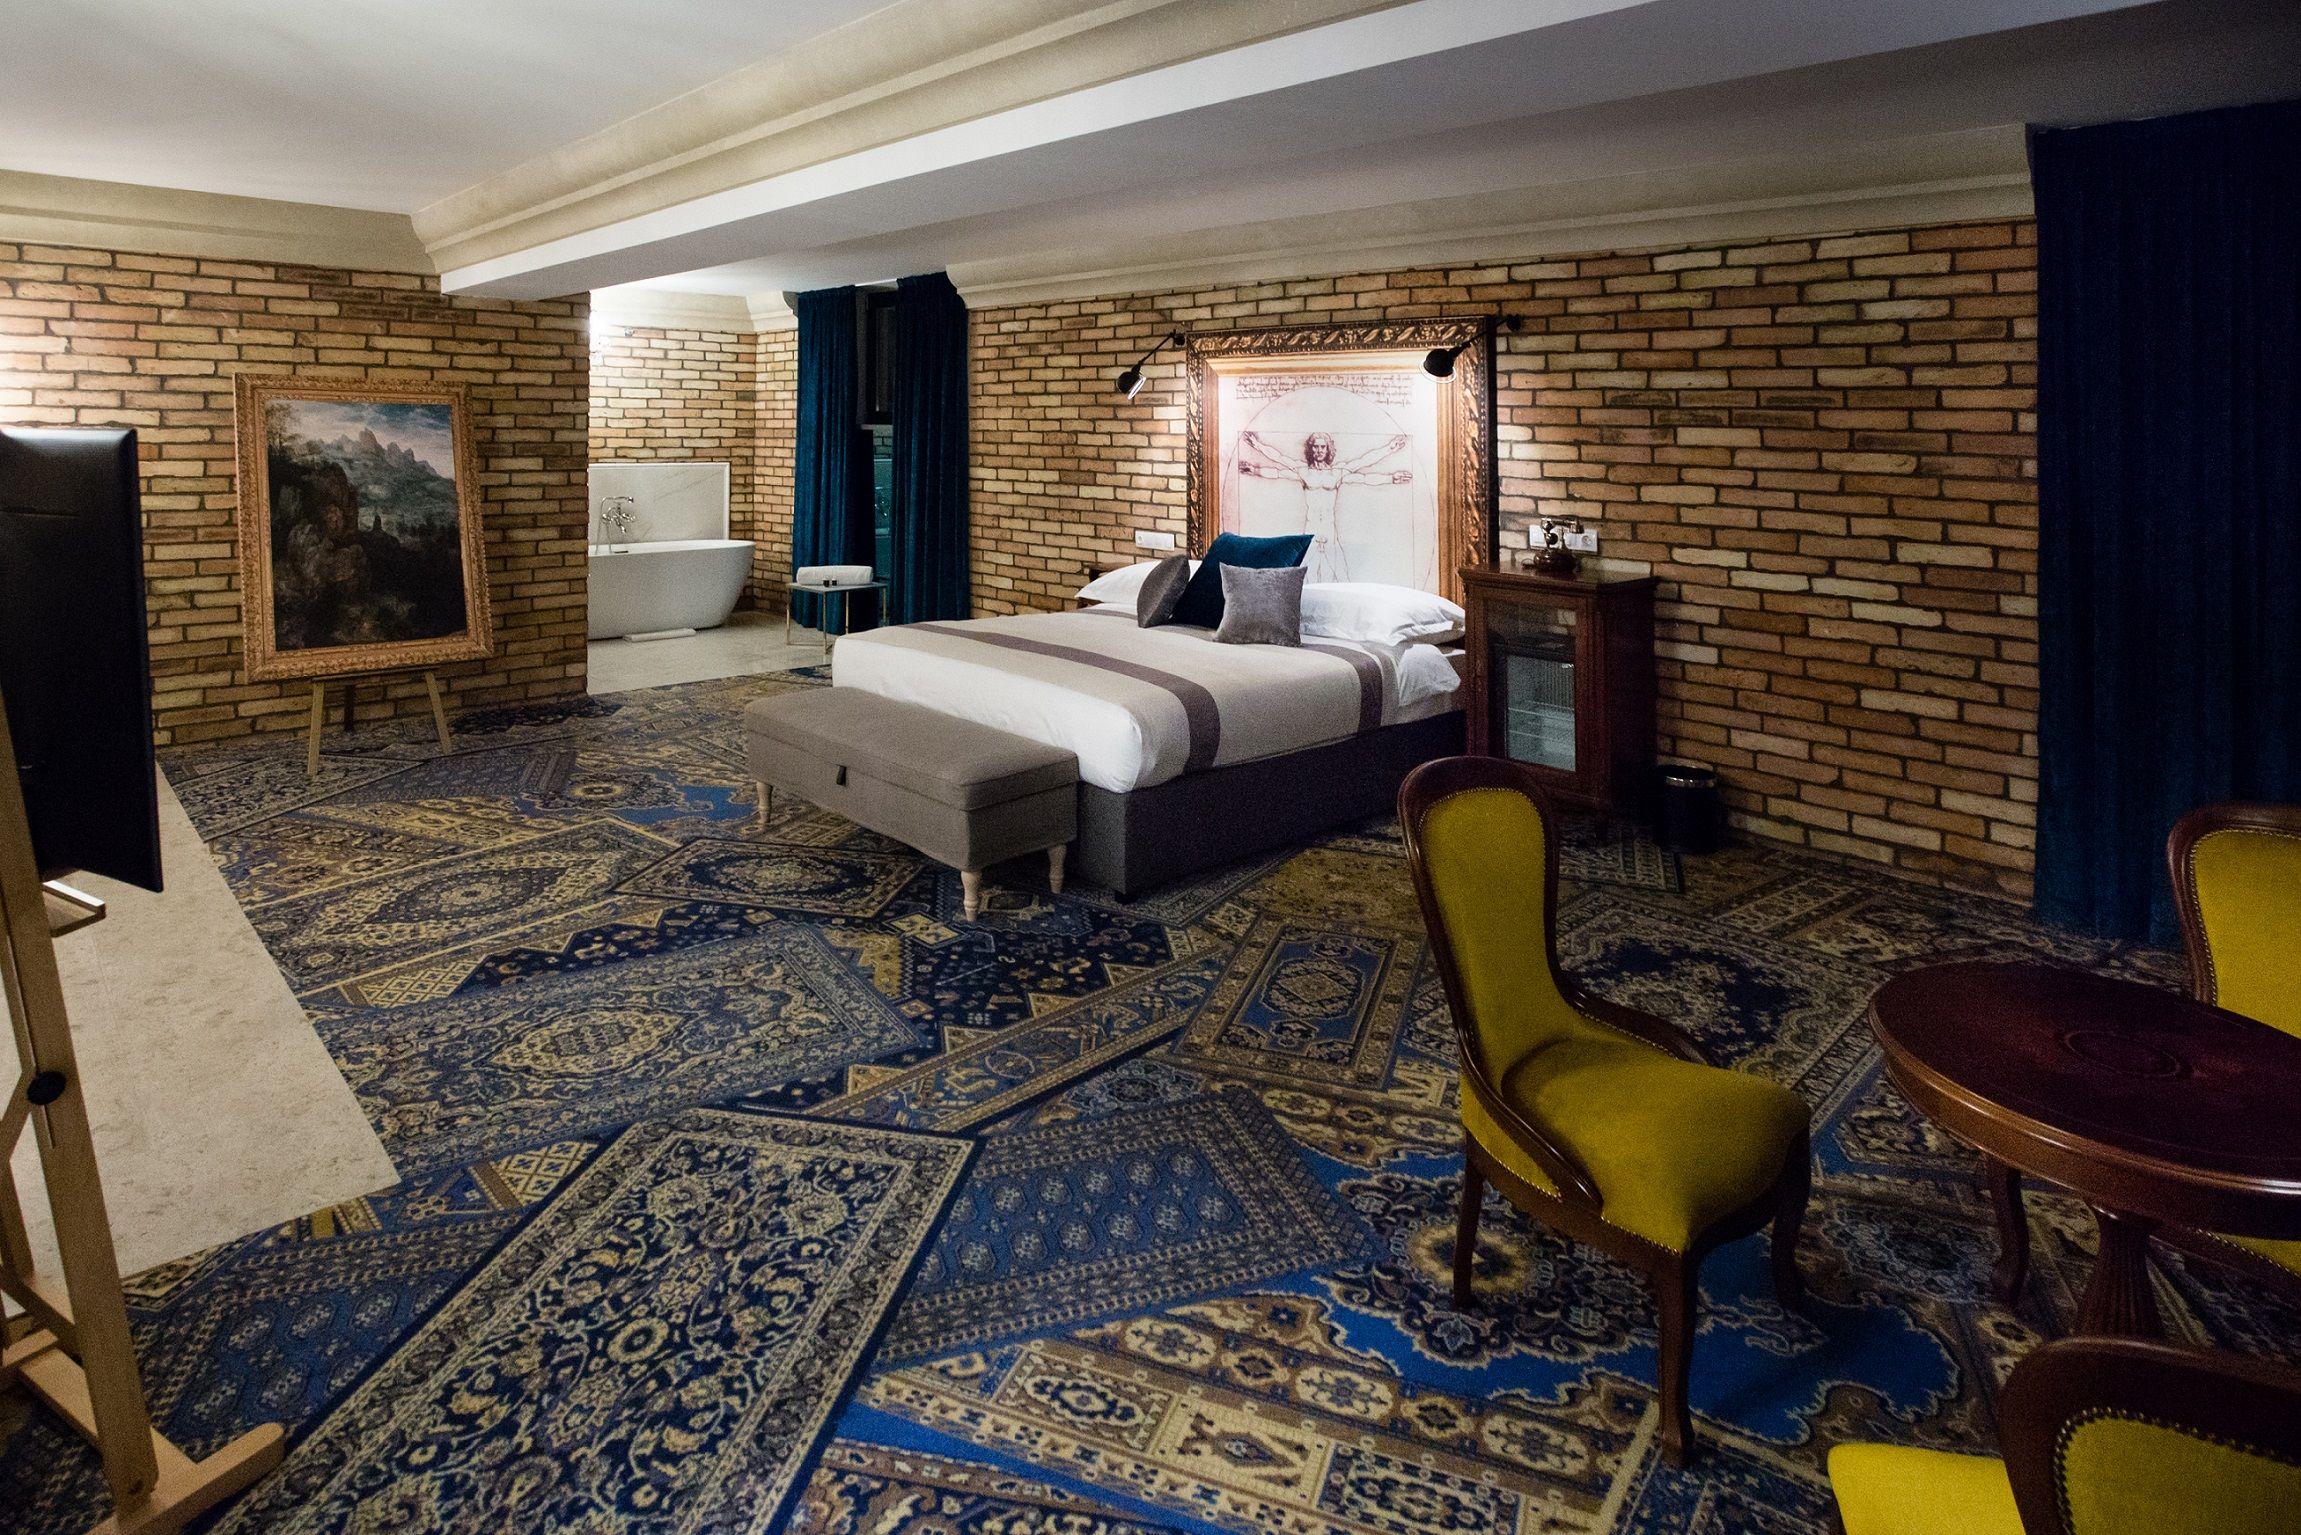 Atelier Studio - Mystery Hotel Budapest